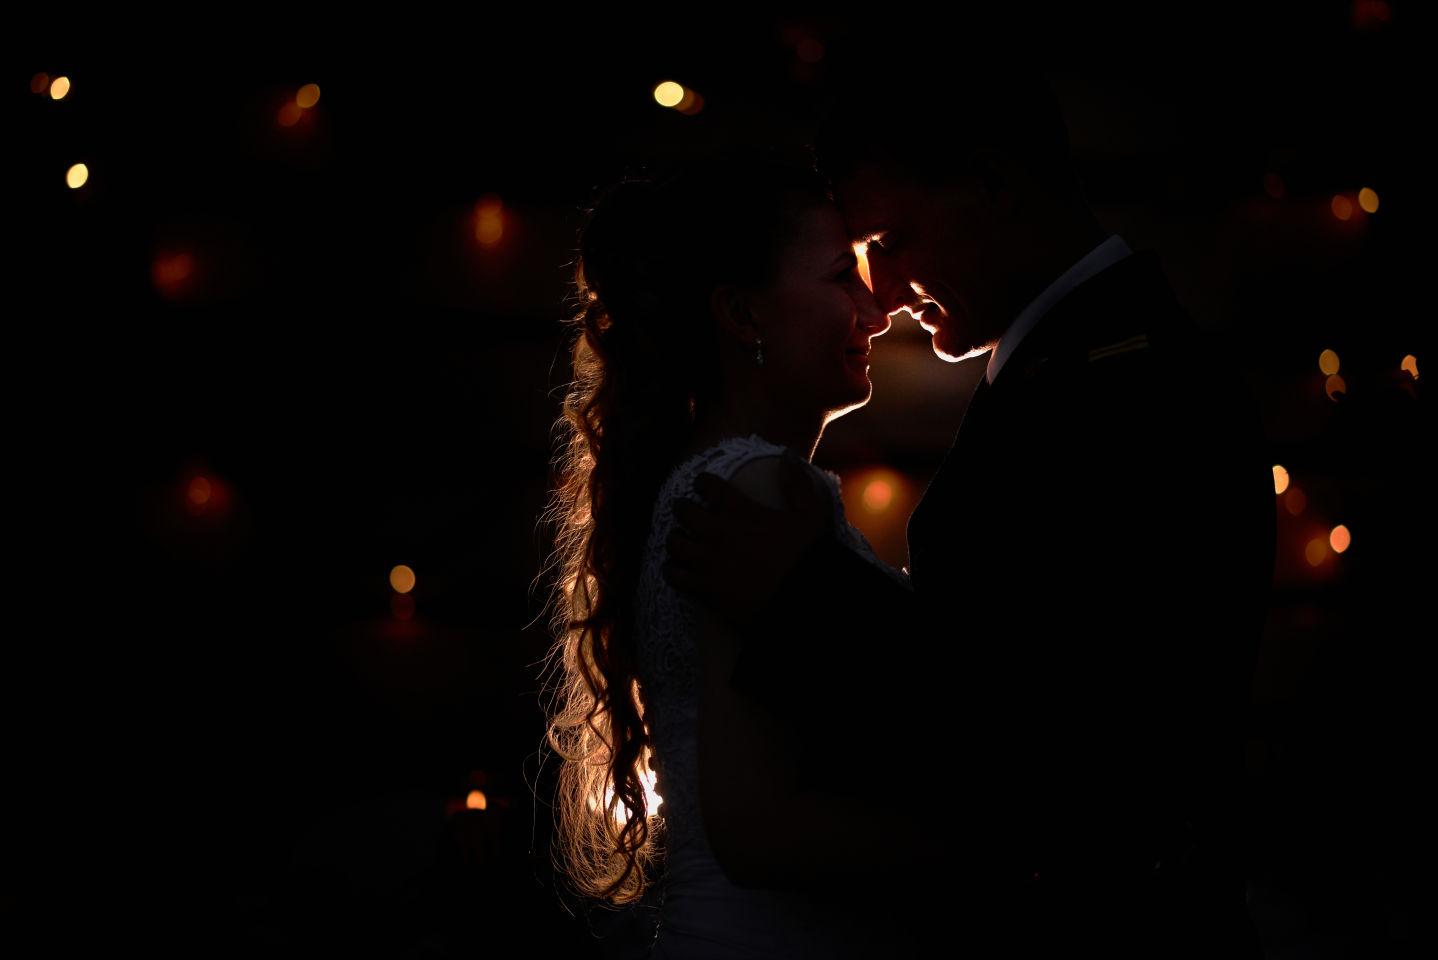 taniec w gwiazdach